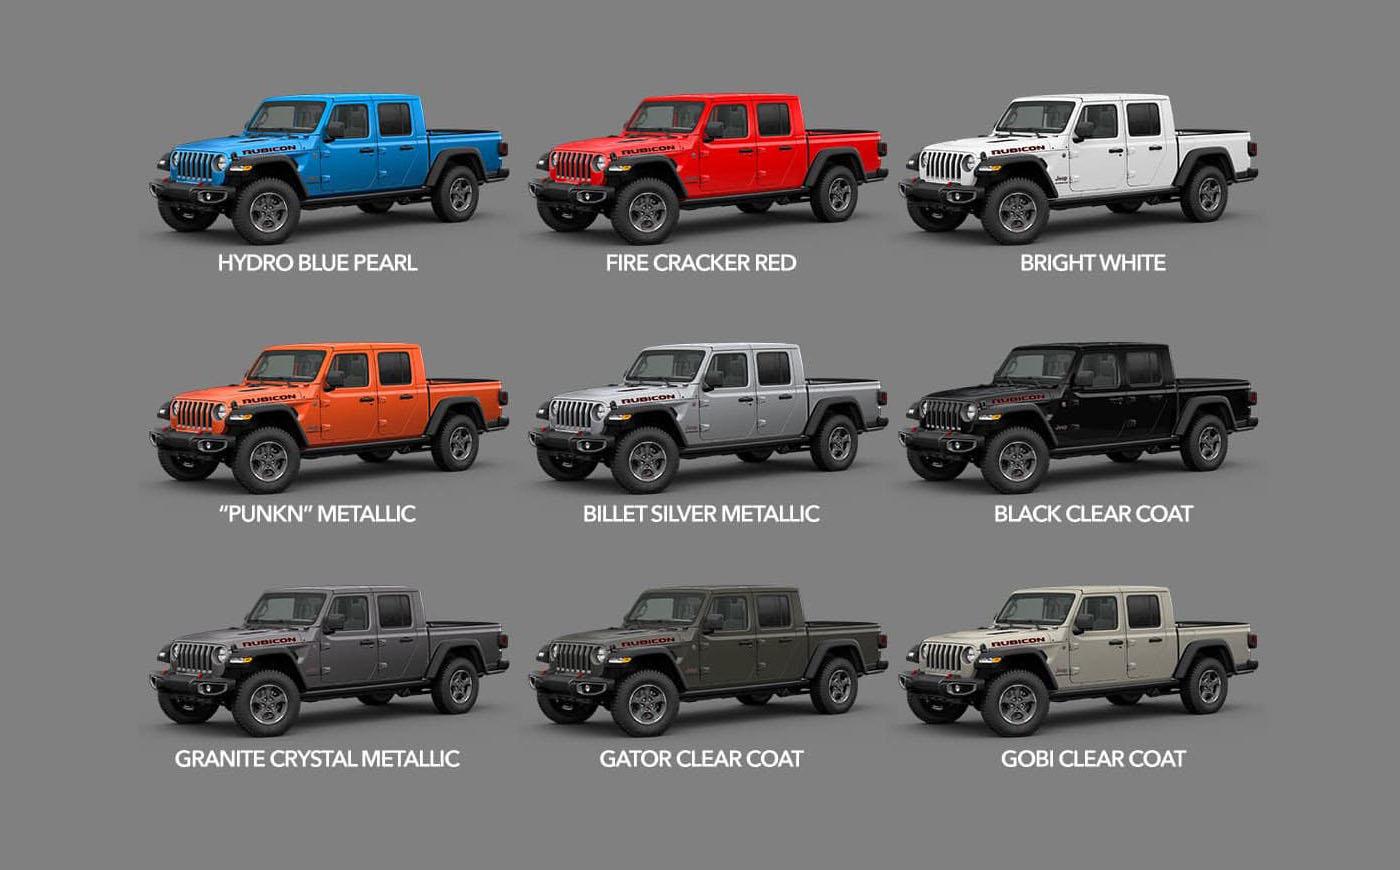 2020 Jeep Gladiator Interior Colors